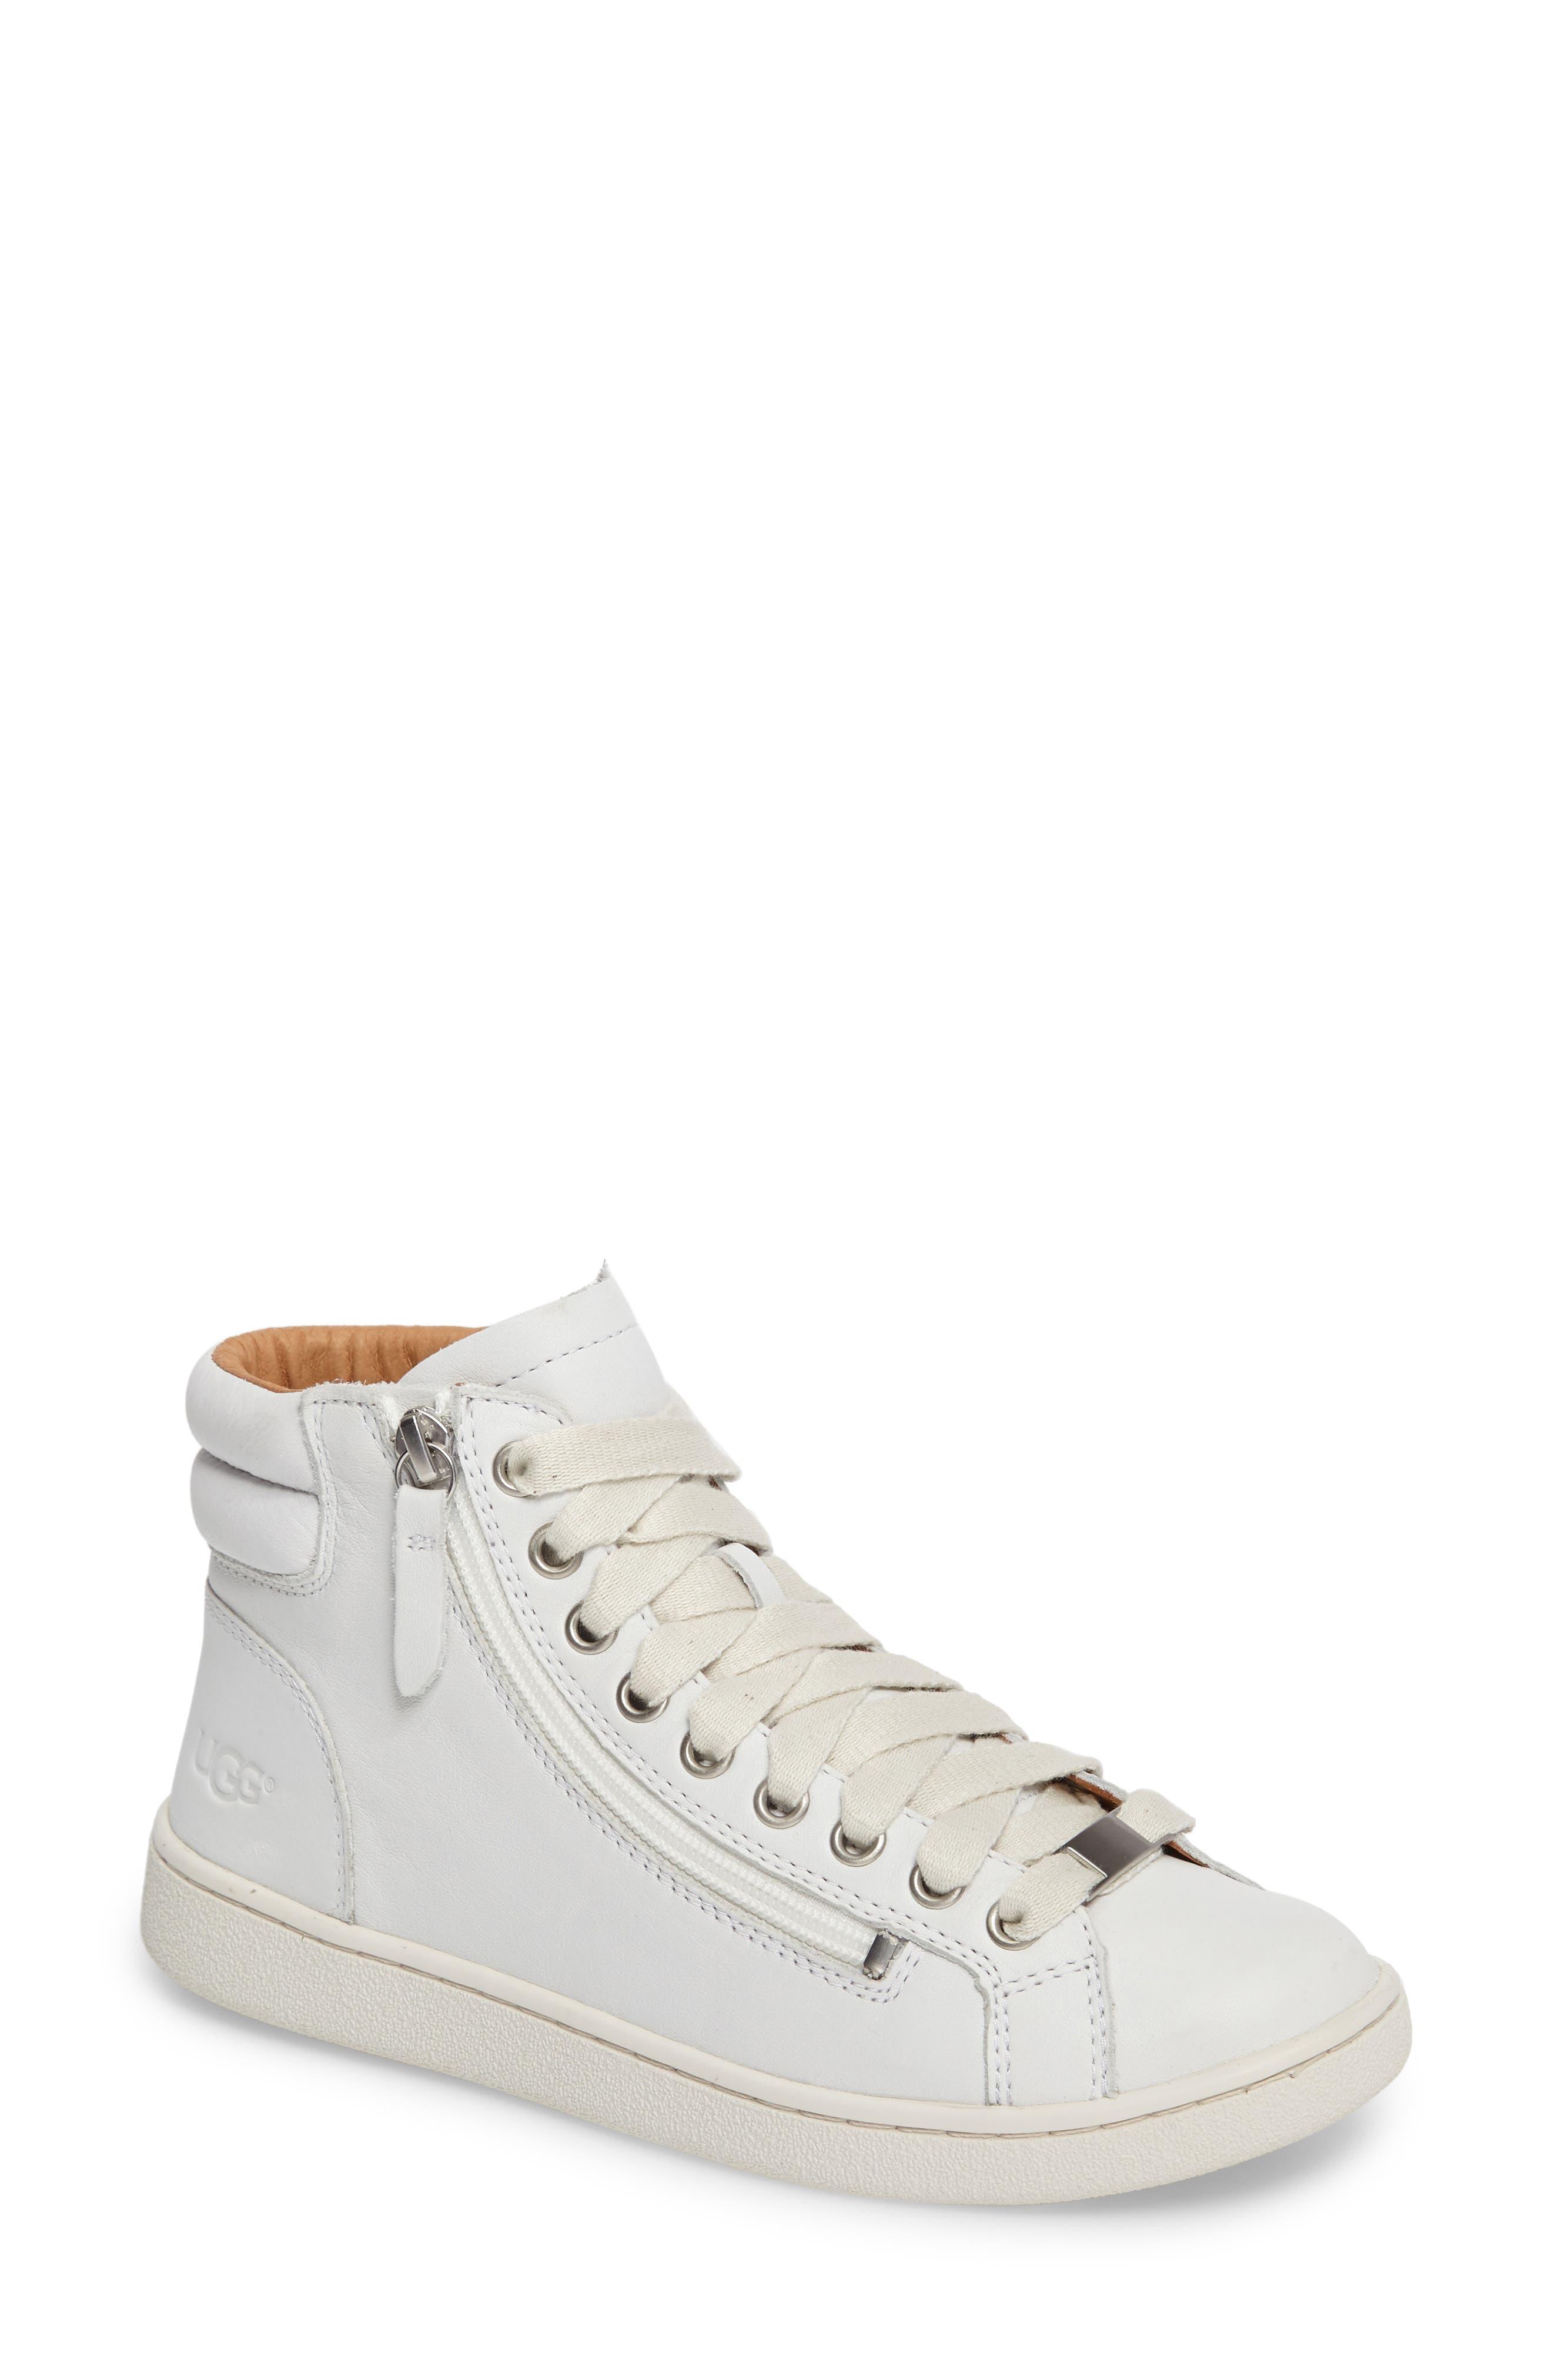 Alternate Image 1 Selected - UGG Olive High Top Sneaker (Women)